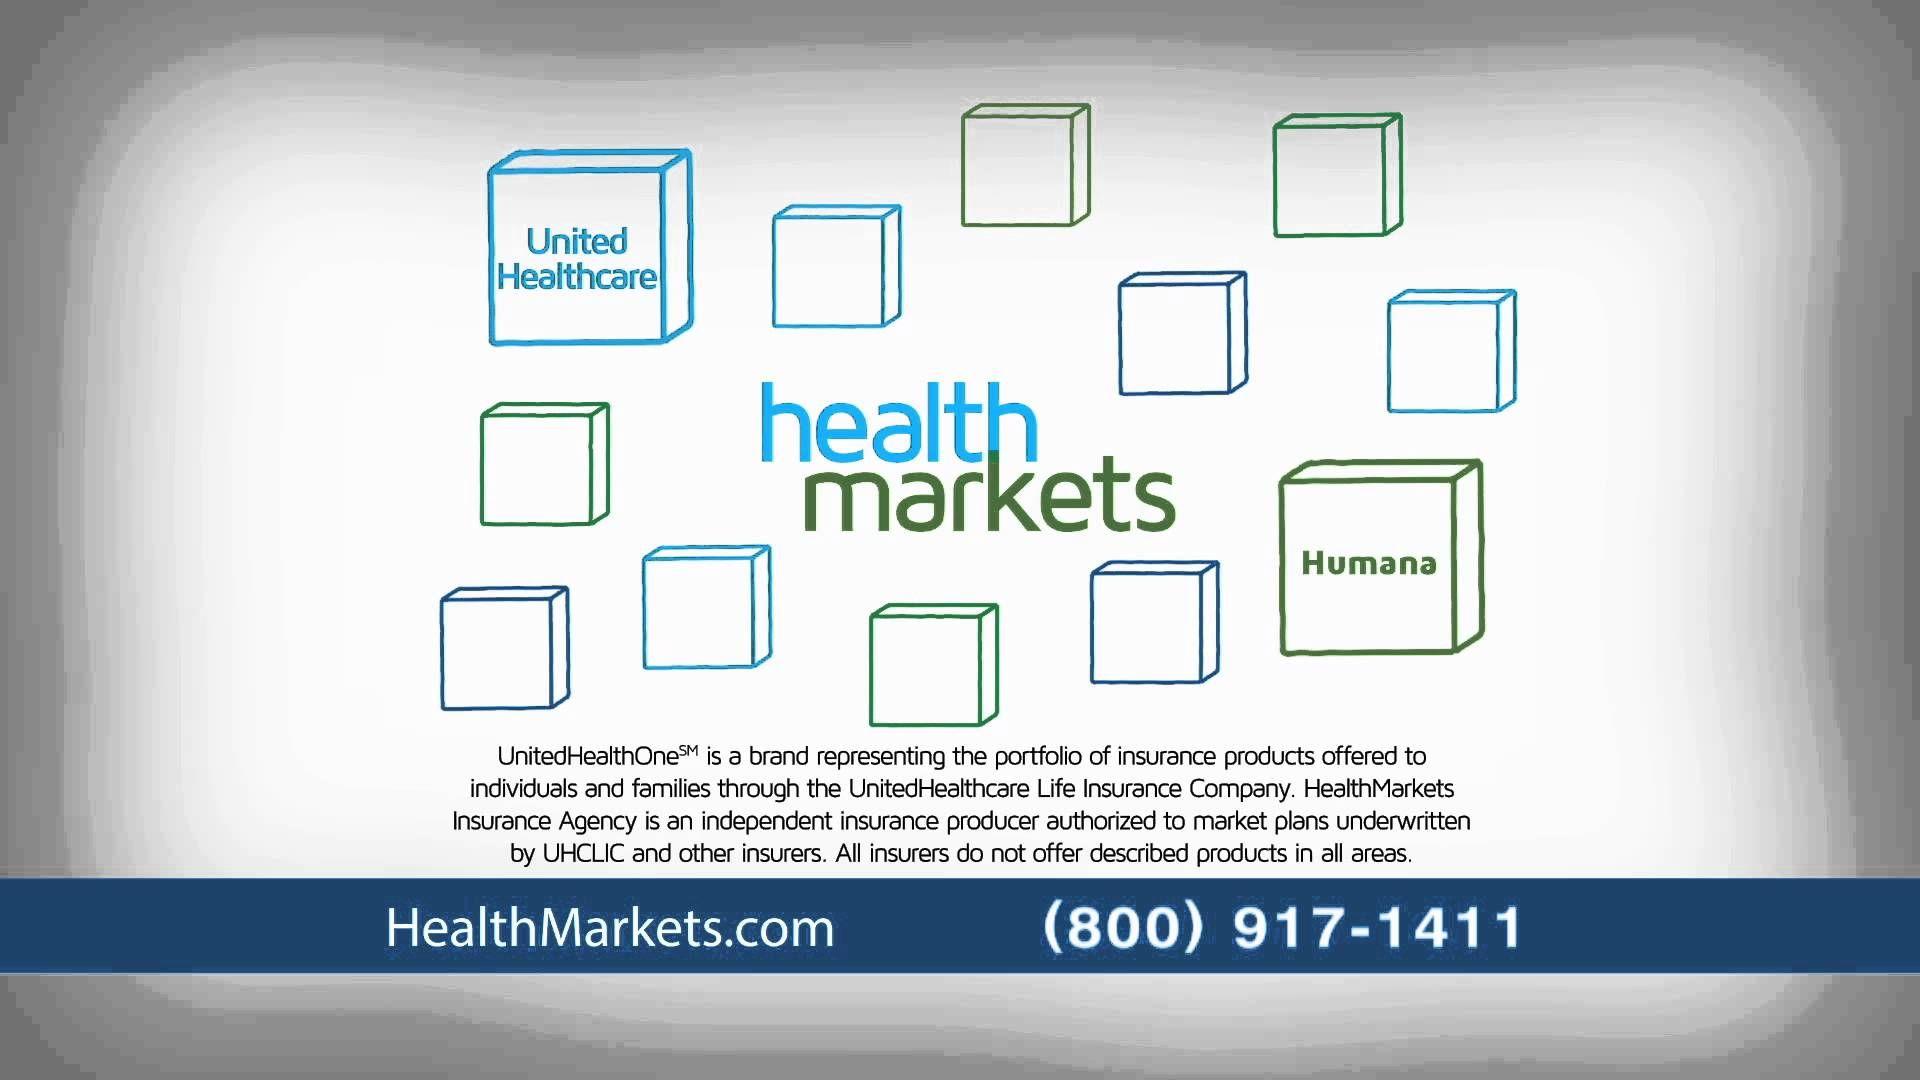 Healthmarkets Solutions Video Life Insurance Companies